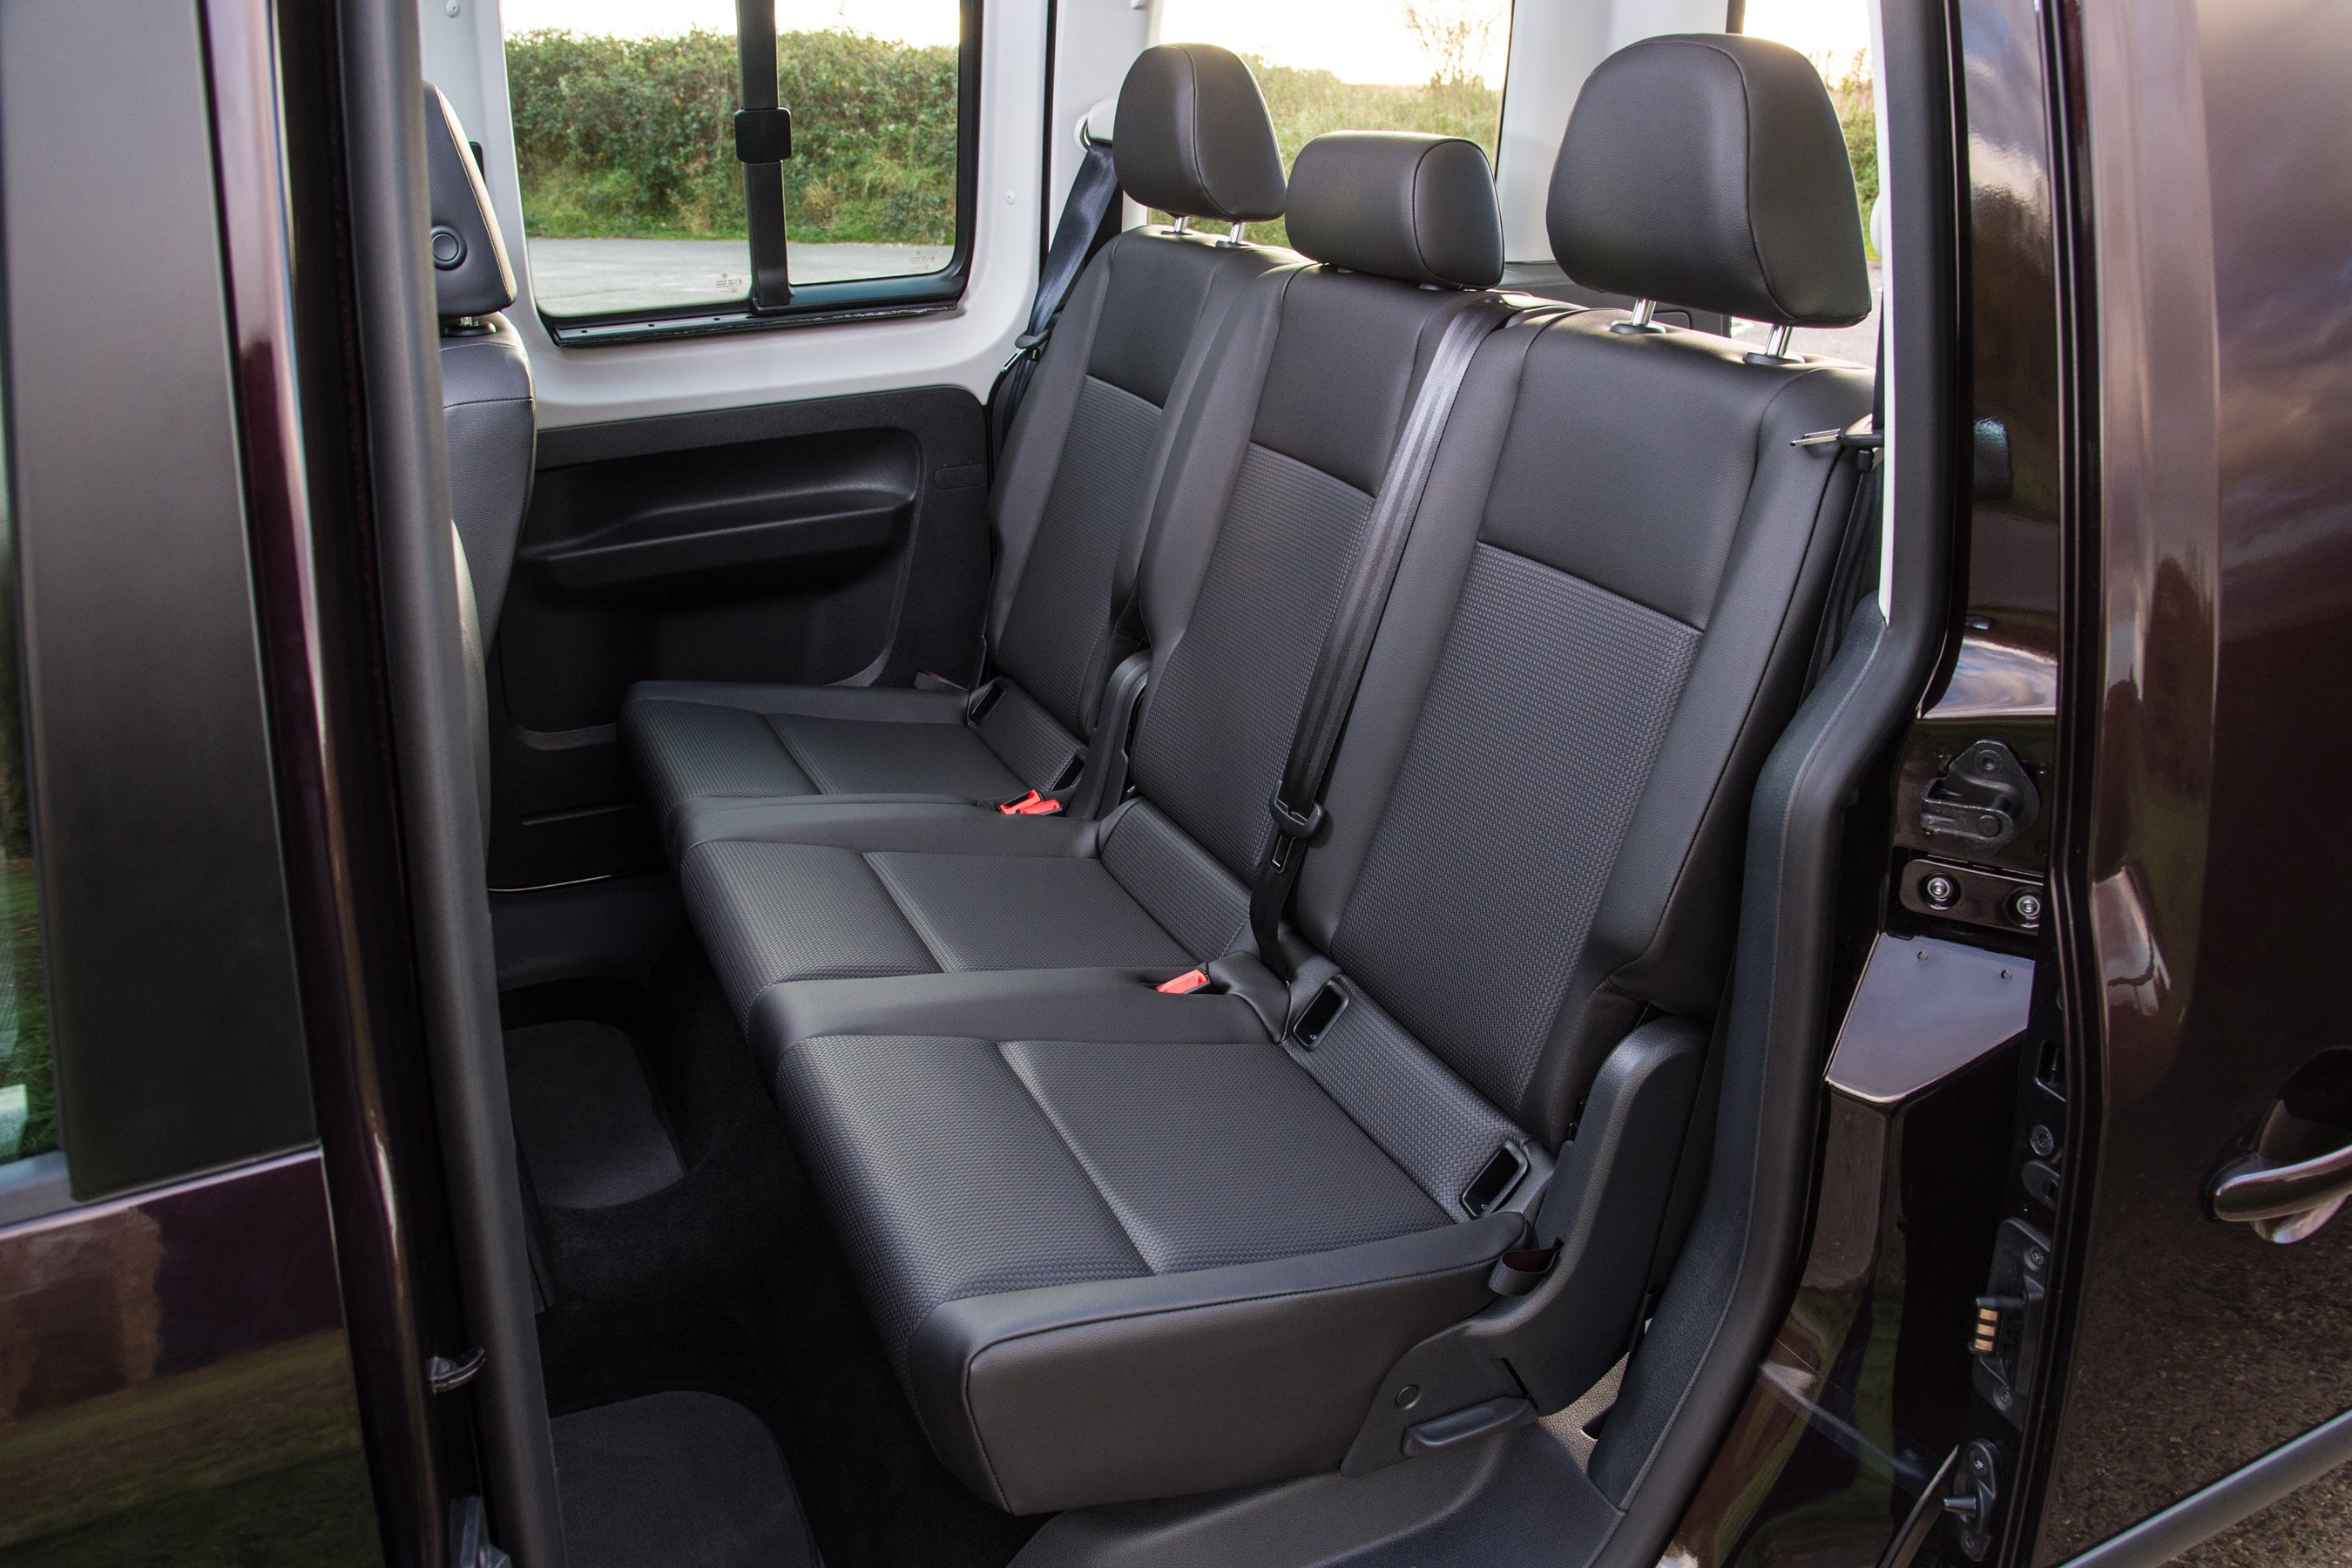 Volkswagen Caddy Life rear seats